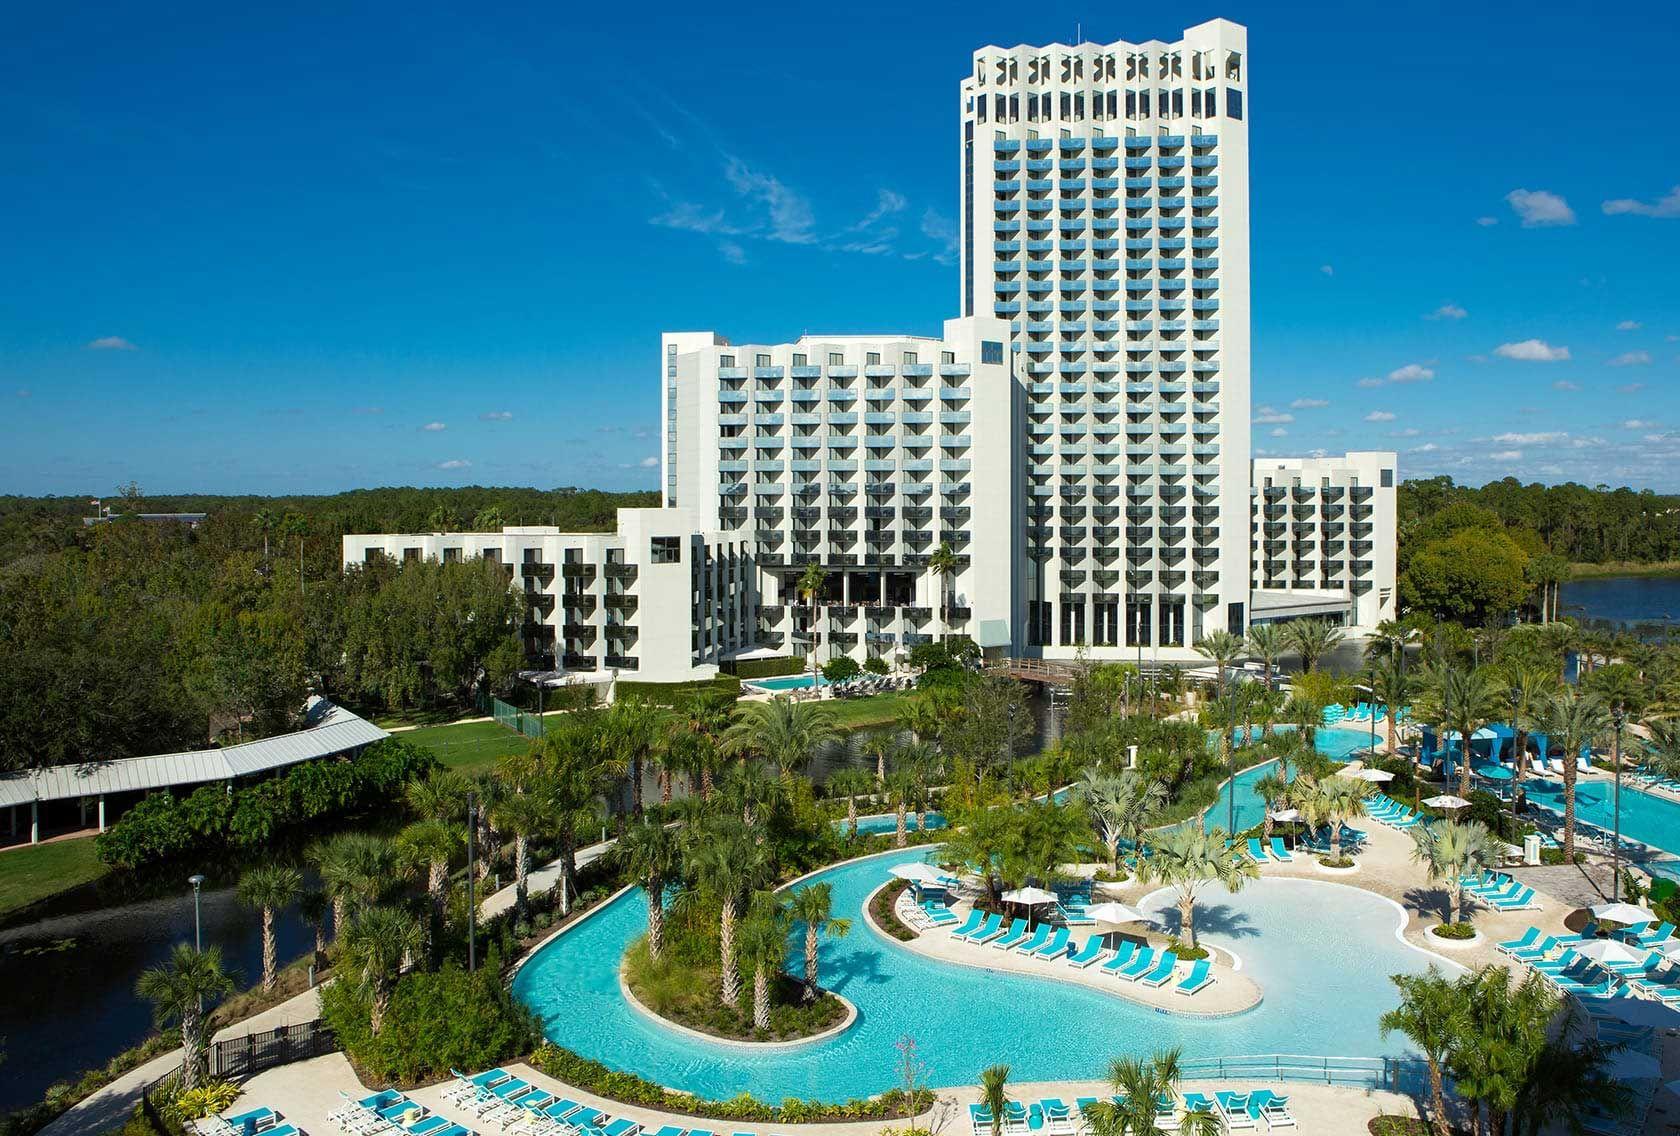 Seven Disney Springs Resort Area Hotels Offering Special Fall